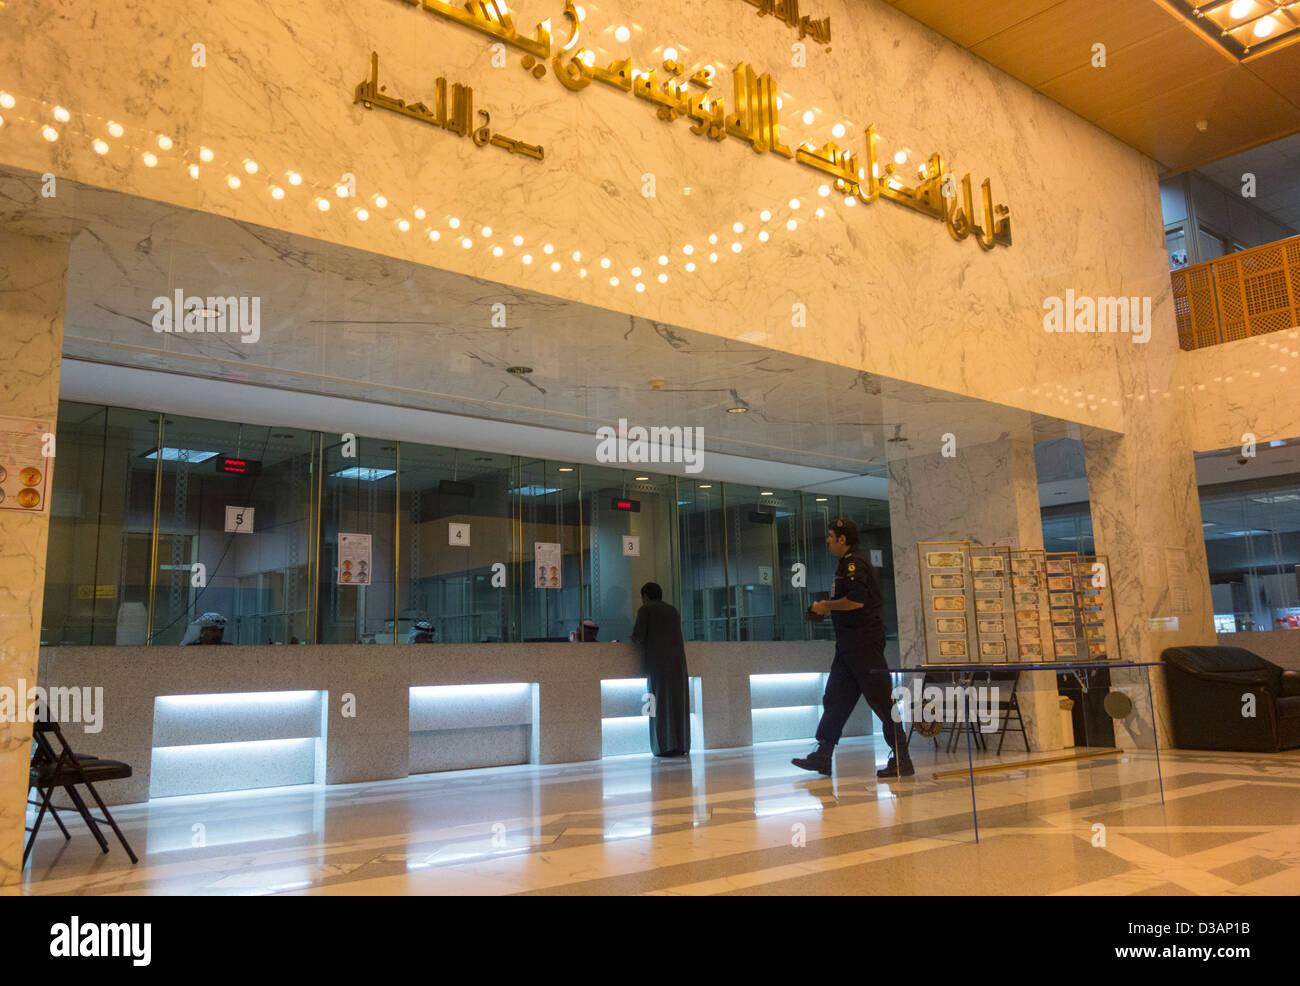 Bank Lobby Customers